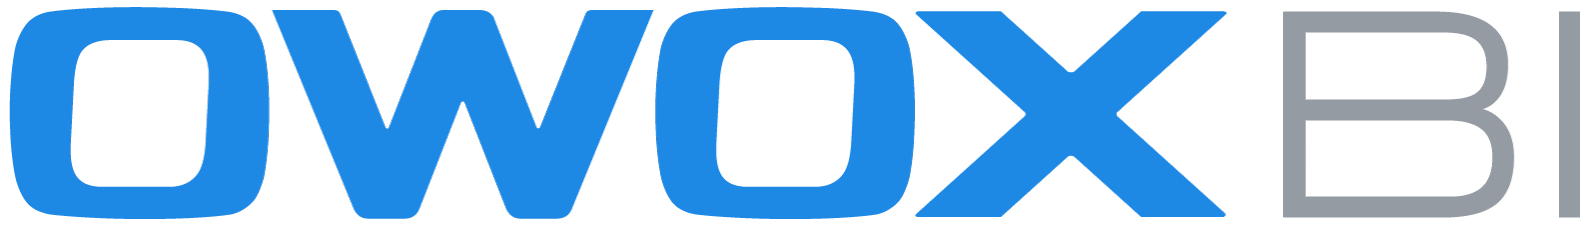 OwoxBI's logo